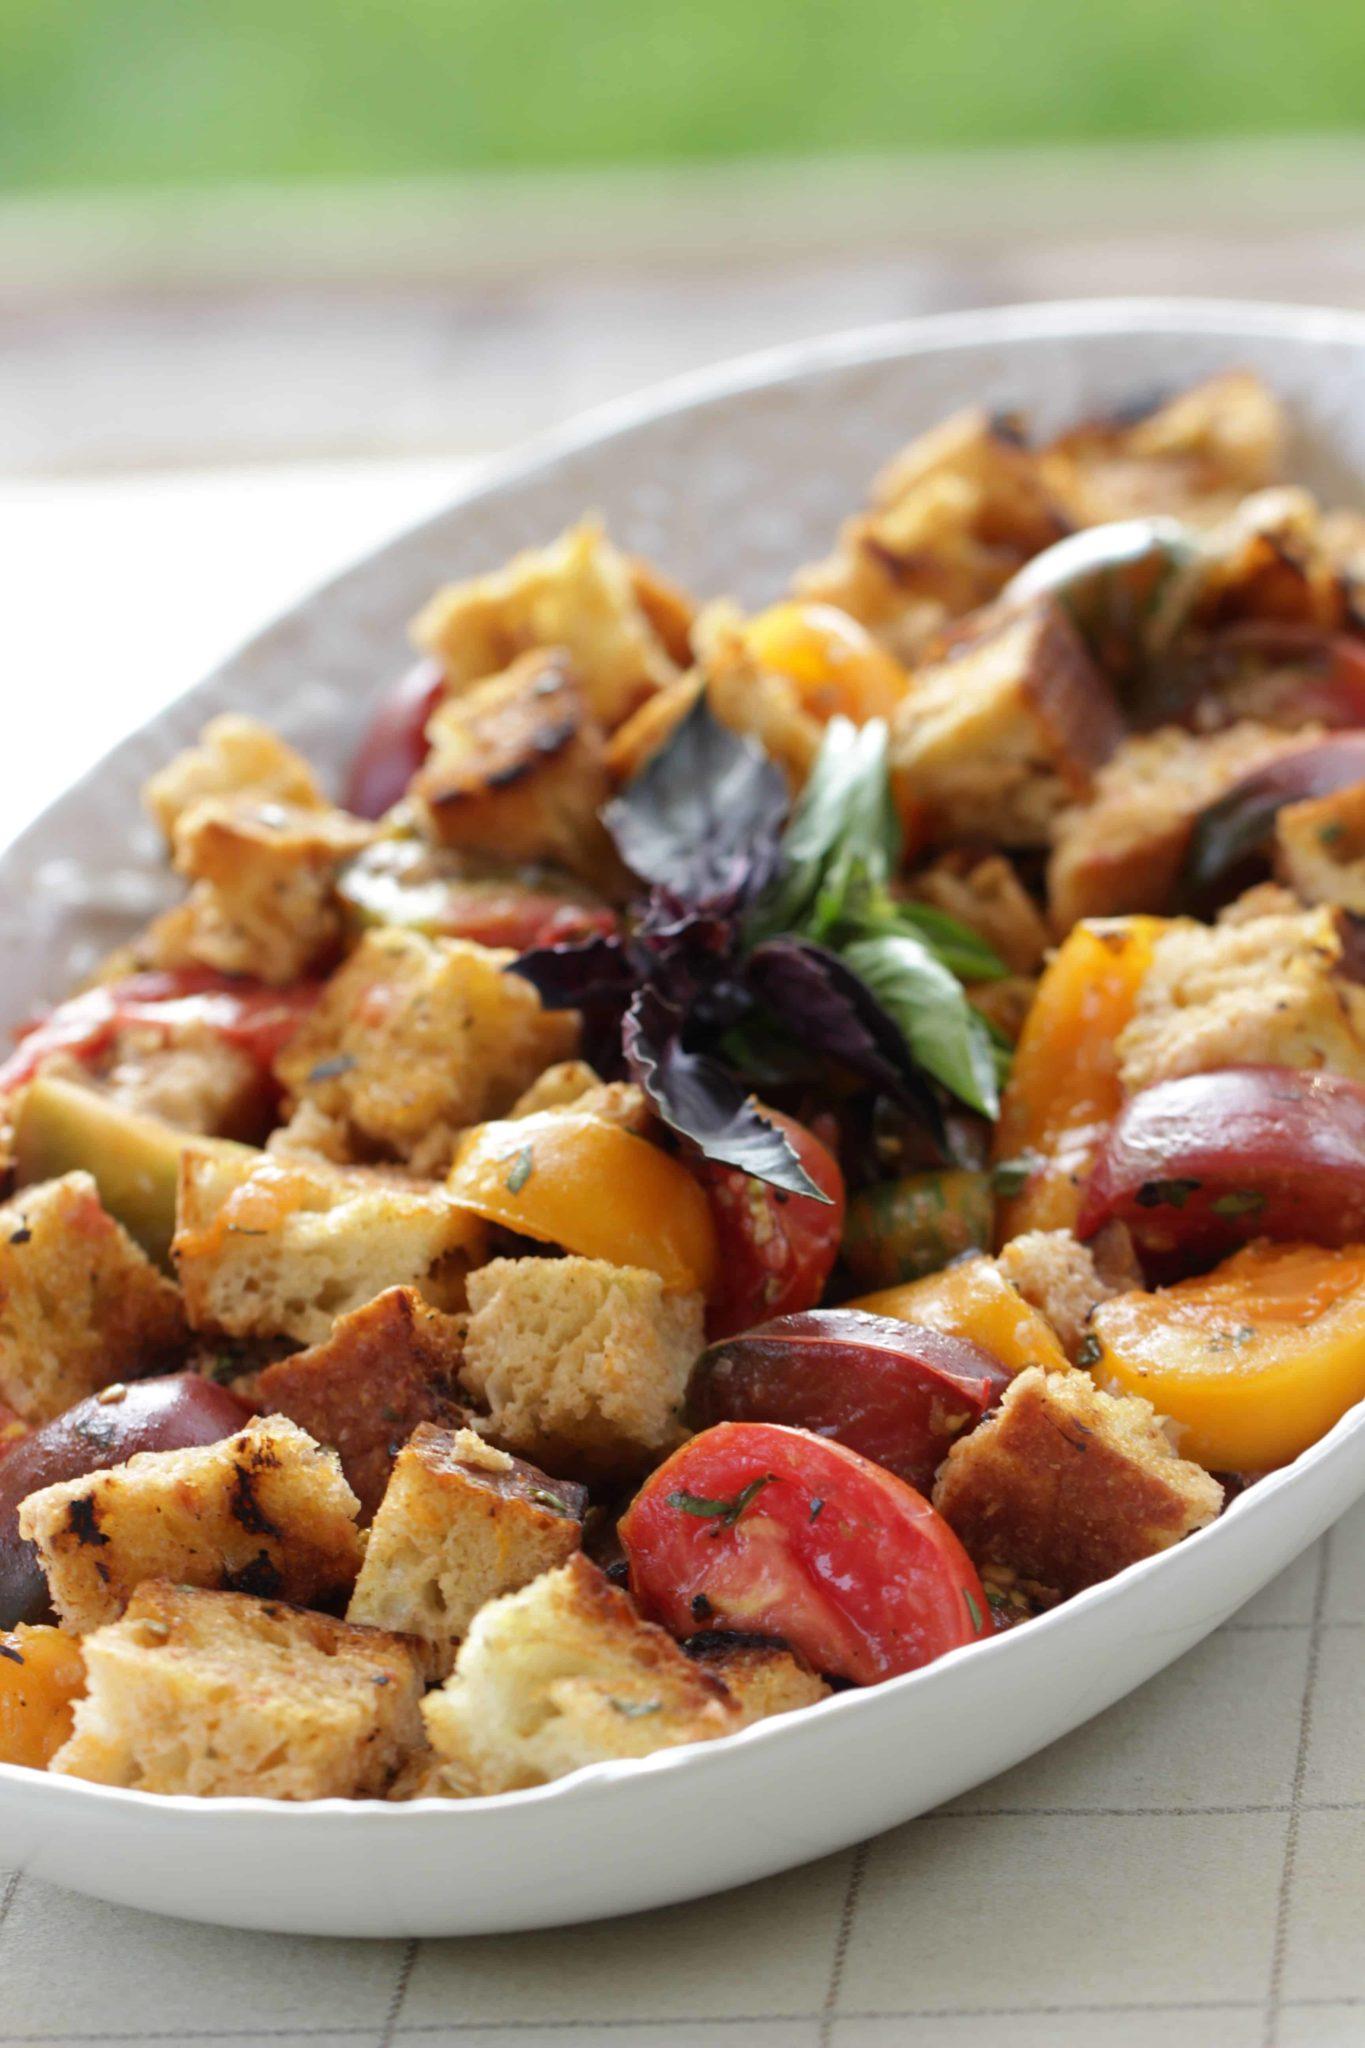 Beth's Grilled Panzanella Salad